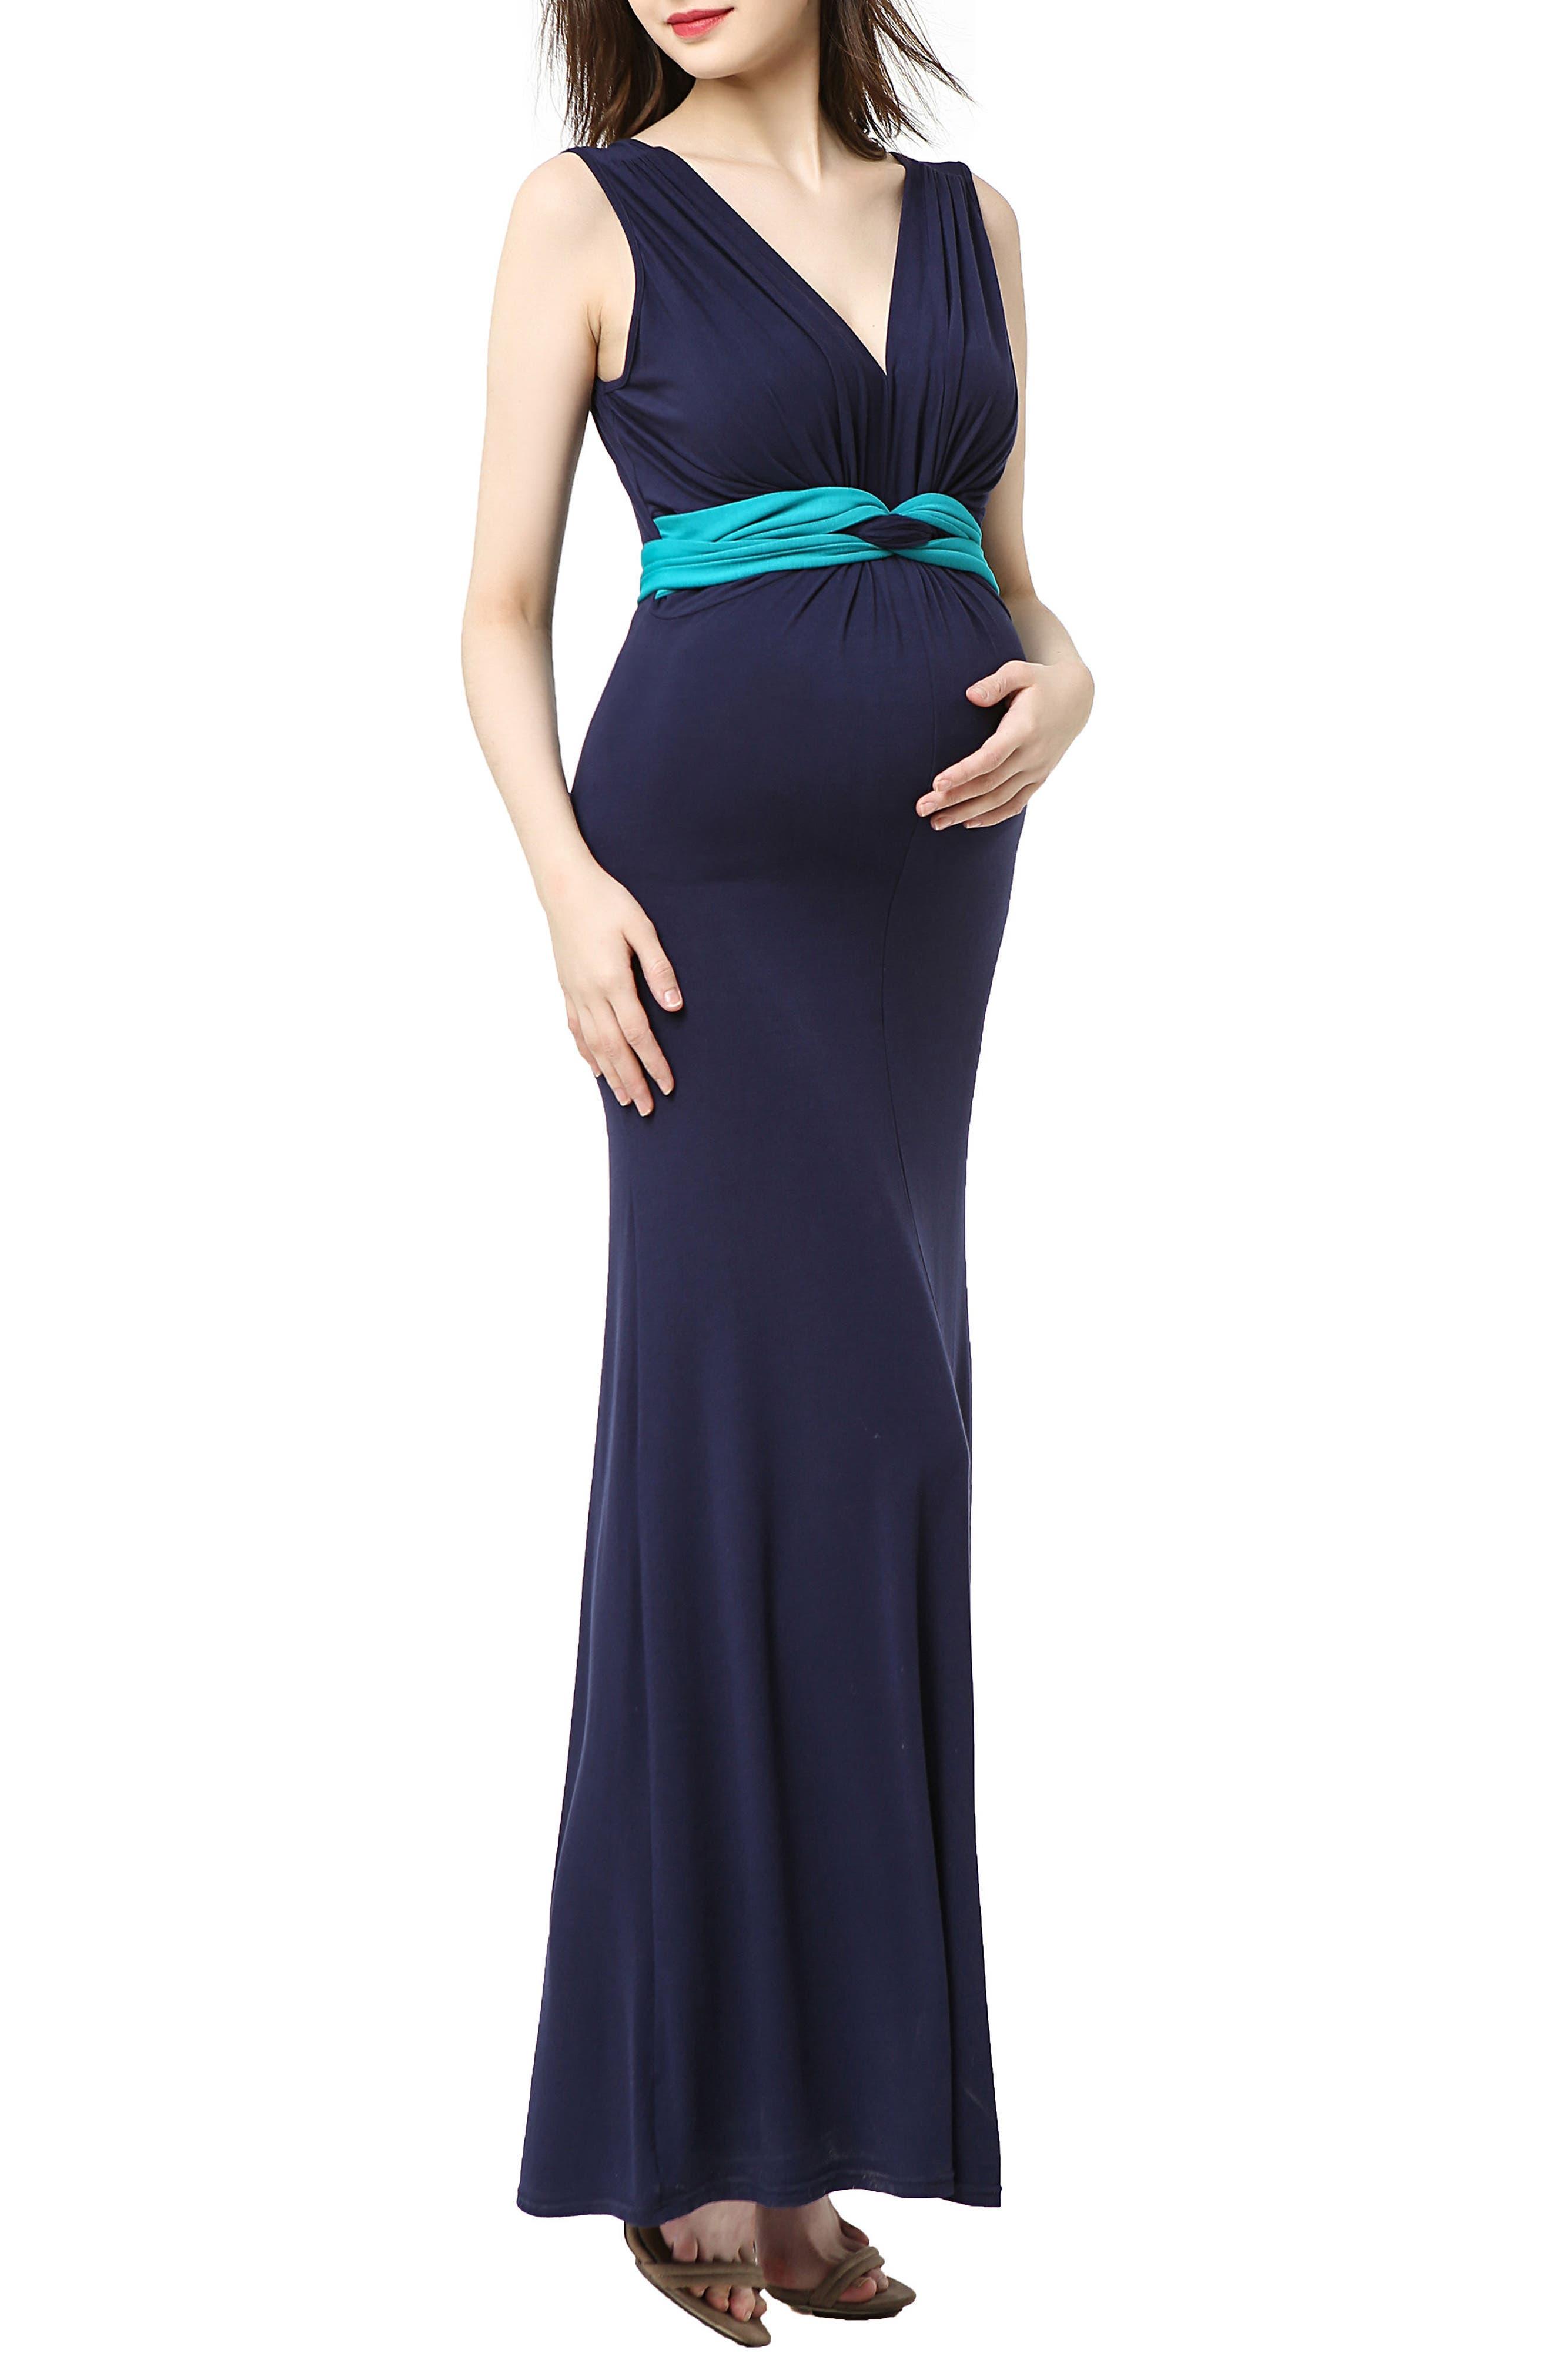 Scarlett Maternity Maxi Dress,                         Main,                         color, Navy/ Teal